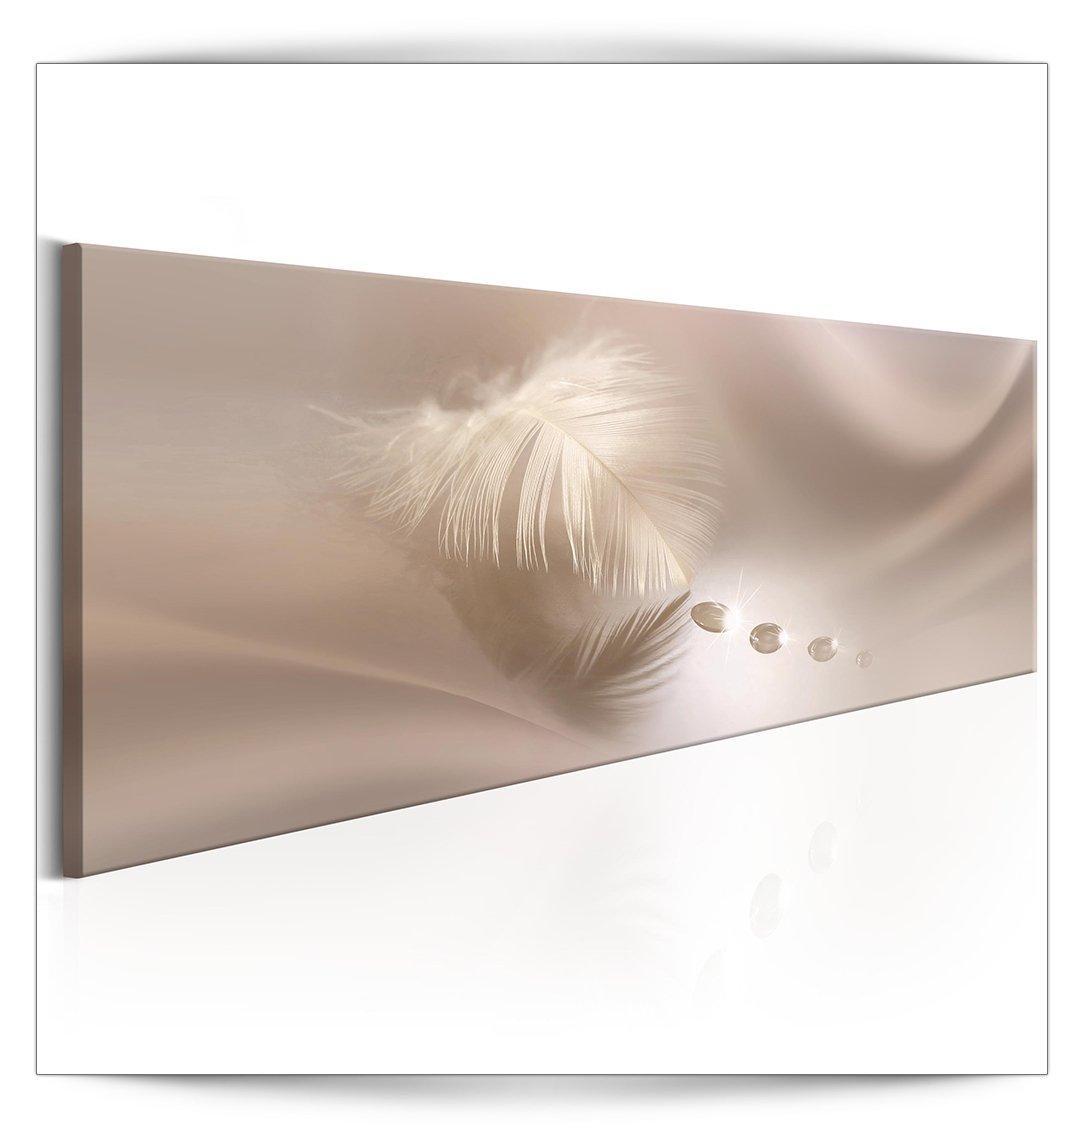 decomonkey Akustikbild Feder 135x45 cm 1 Teilig Bilder Leinwandbilder Wandbilder XXL Schallschlucker Schallschutz Akustikdämmung Wandbild Deko leise Tropfen rosa beige